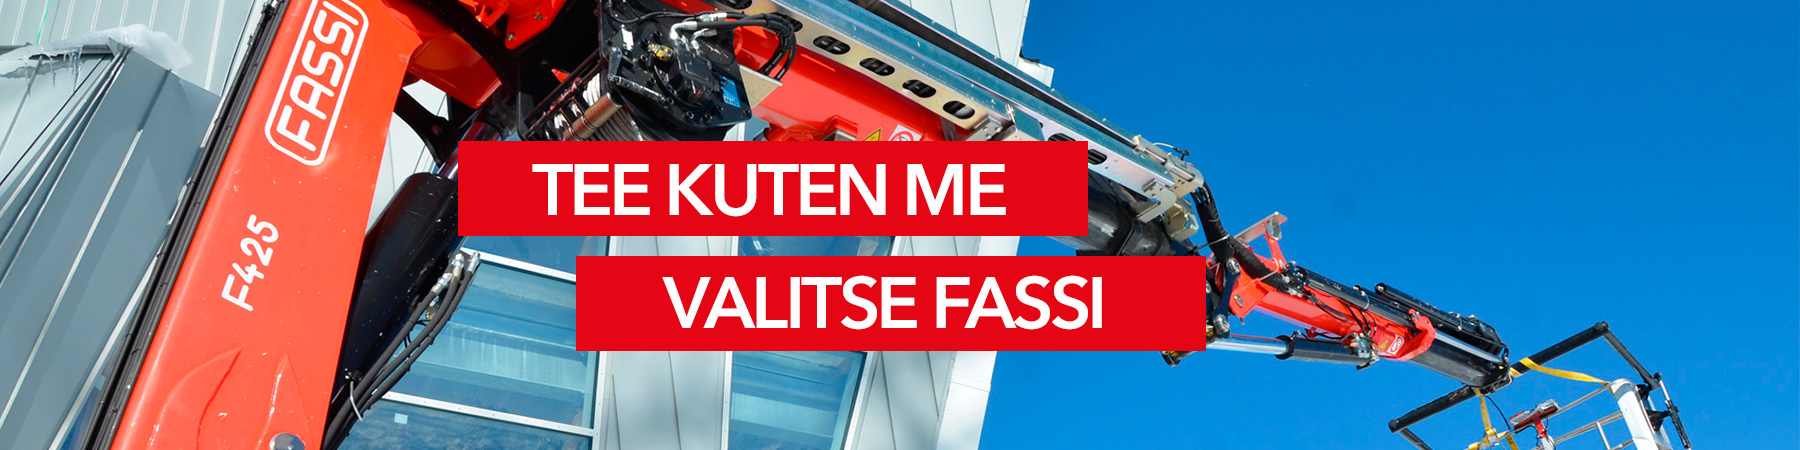 Grutech Oy Fassi-asennusnosturit